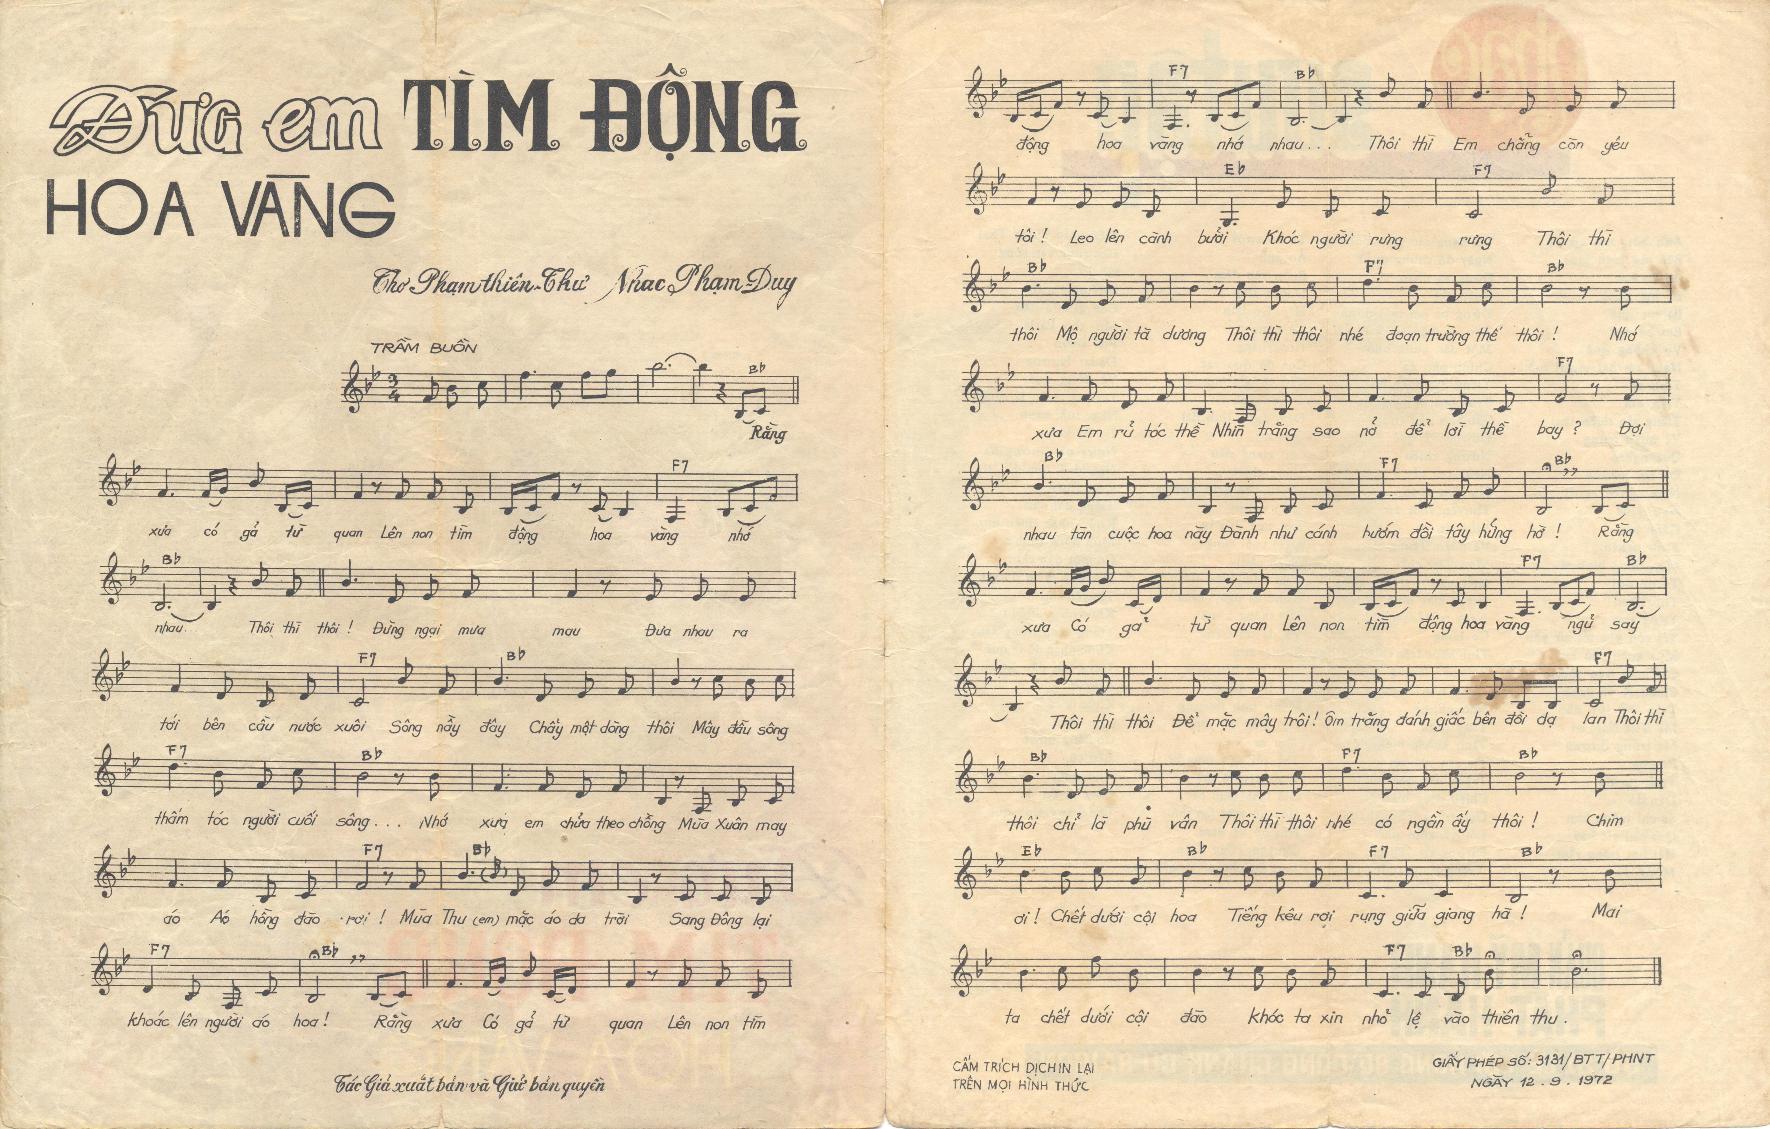 Dua Em Tim Dong Hoa Vang.jpg